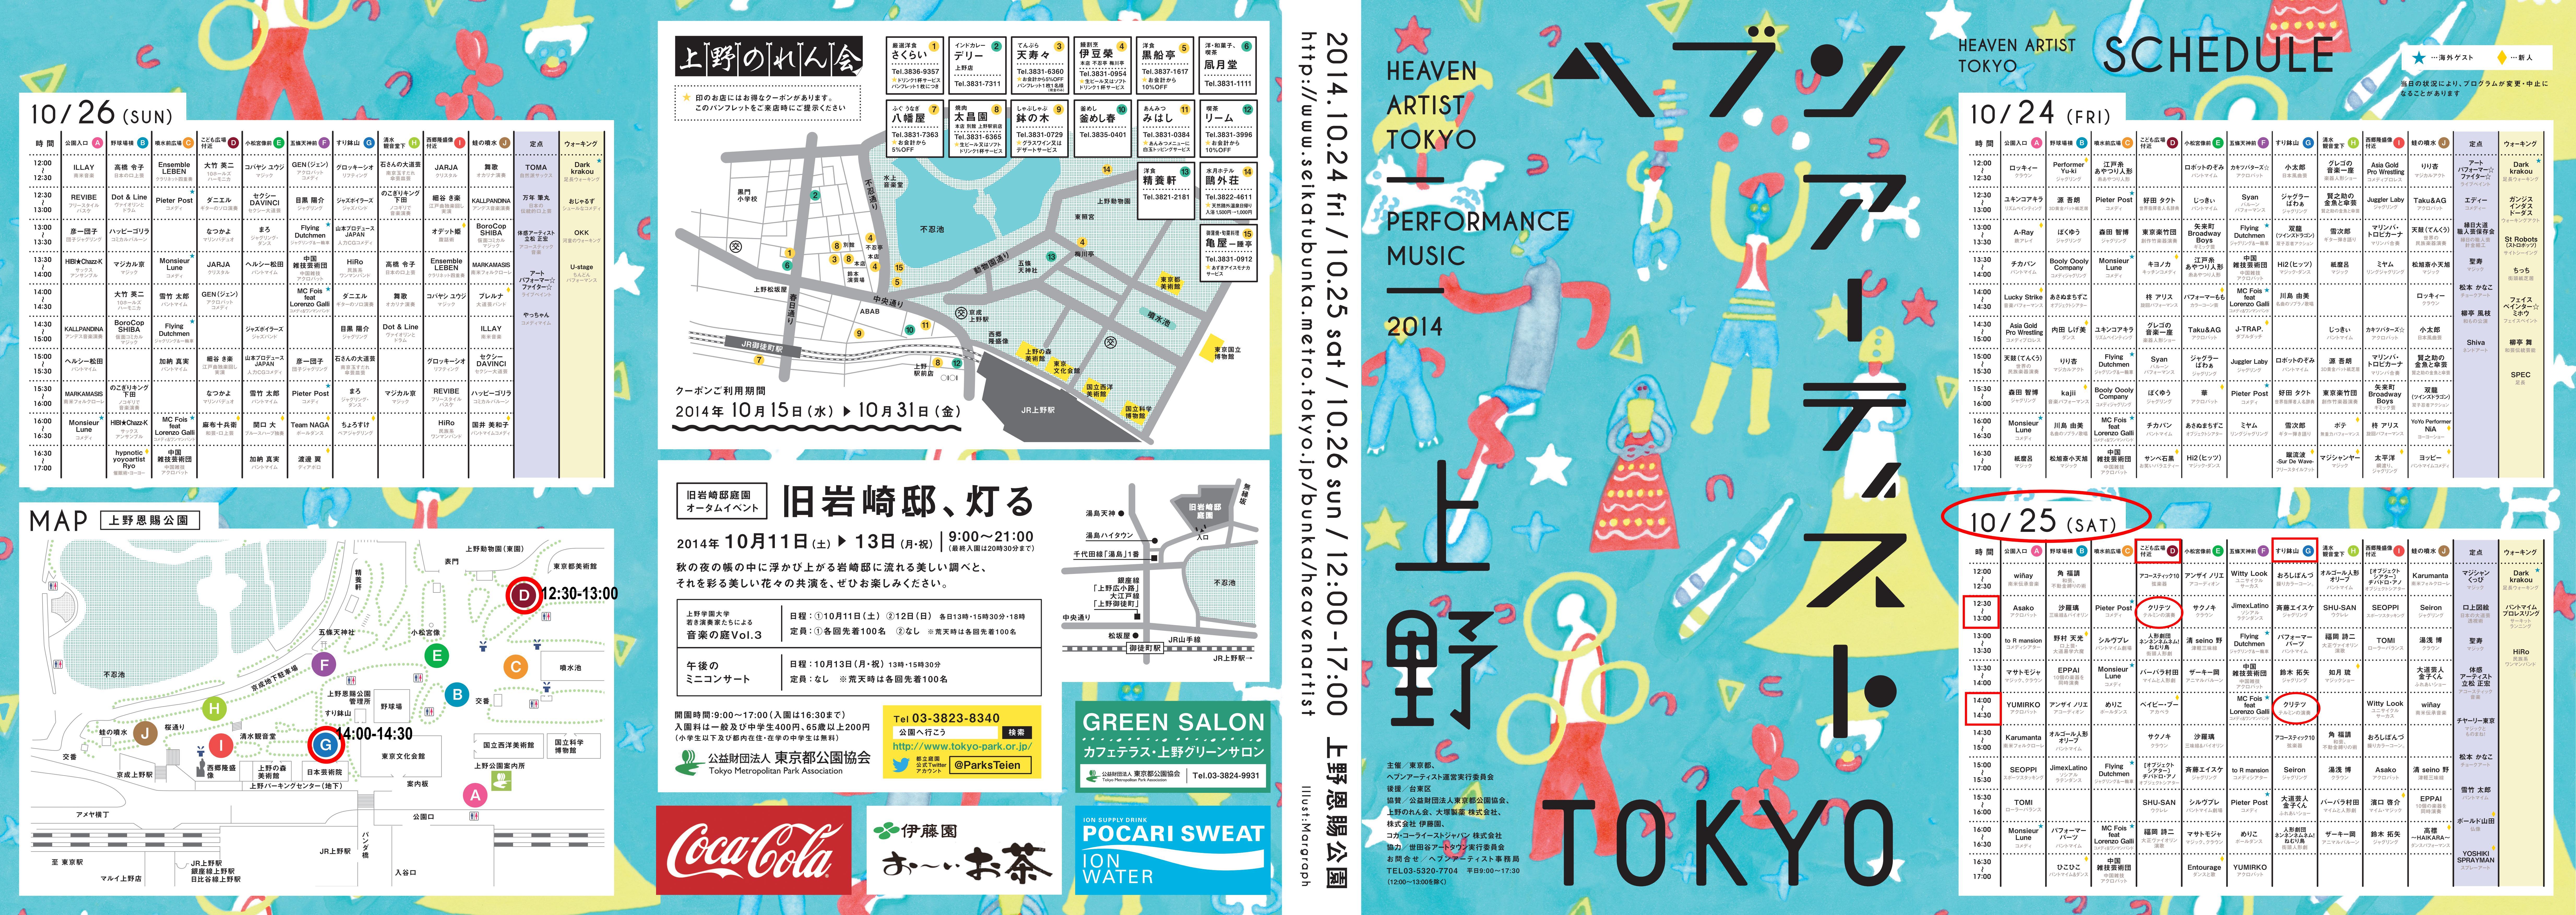 2014tokyoprogram_01.jpg